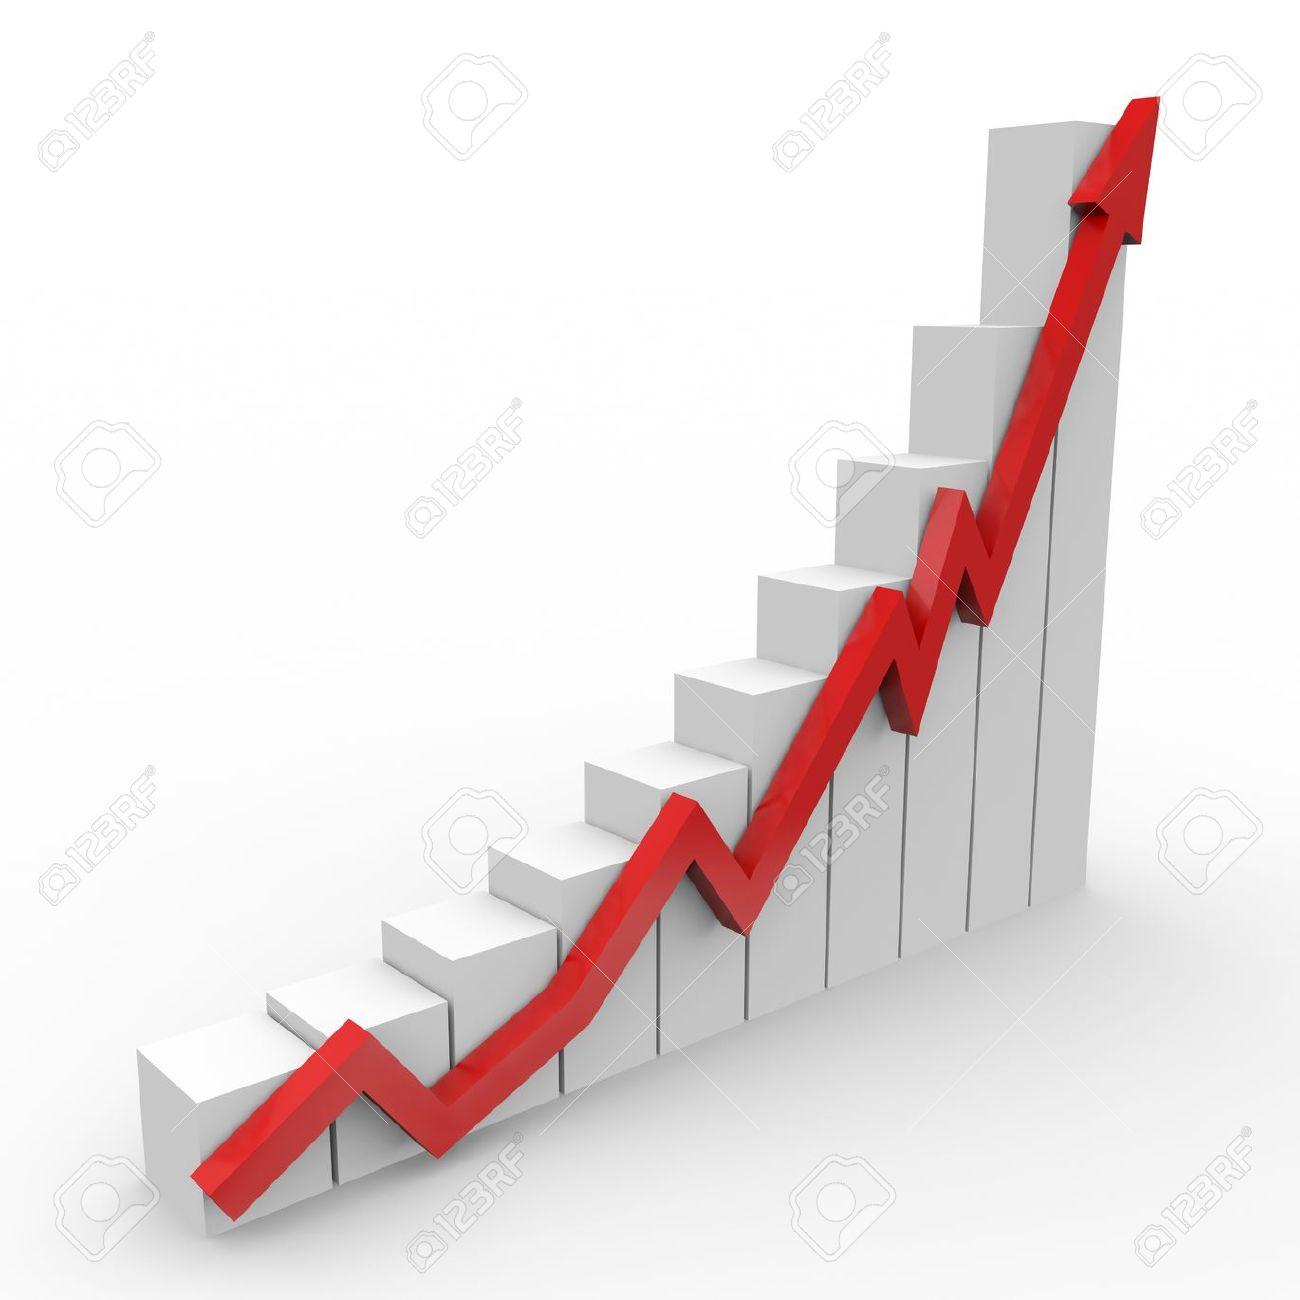 Increase graph clipart.